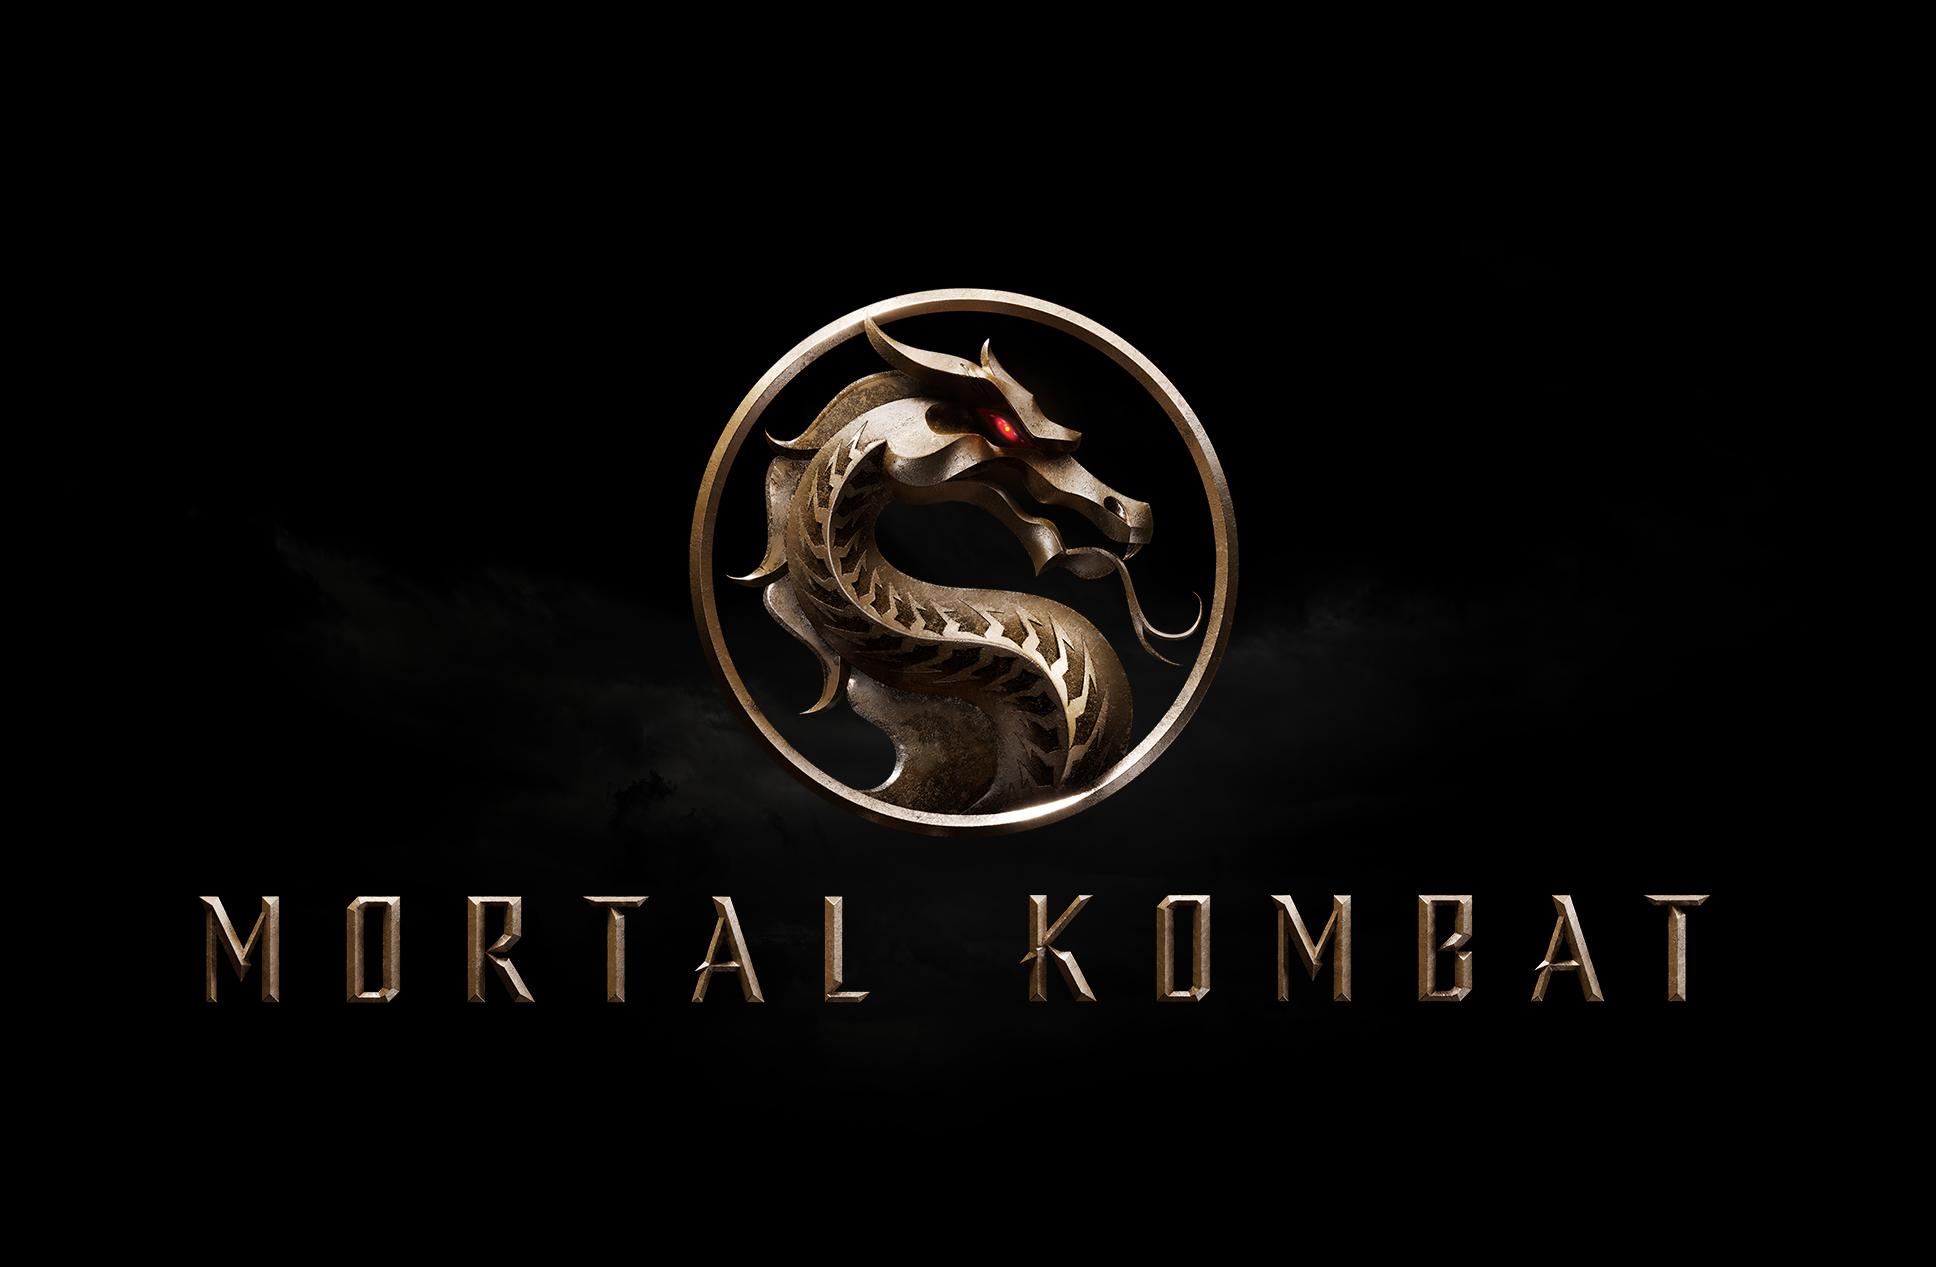 Mortal Kombat image film